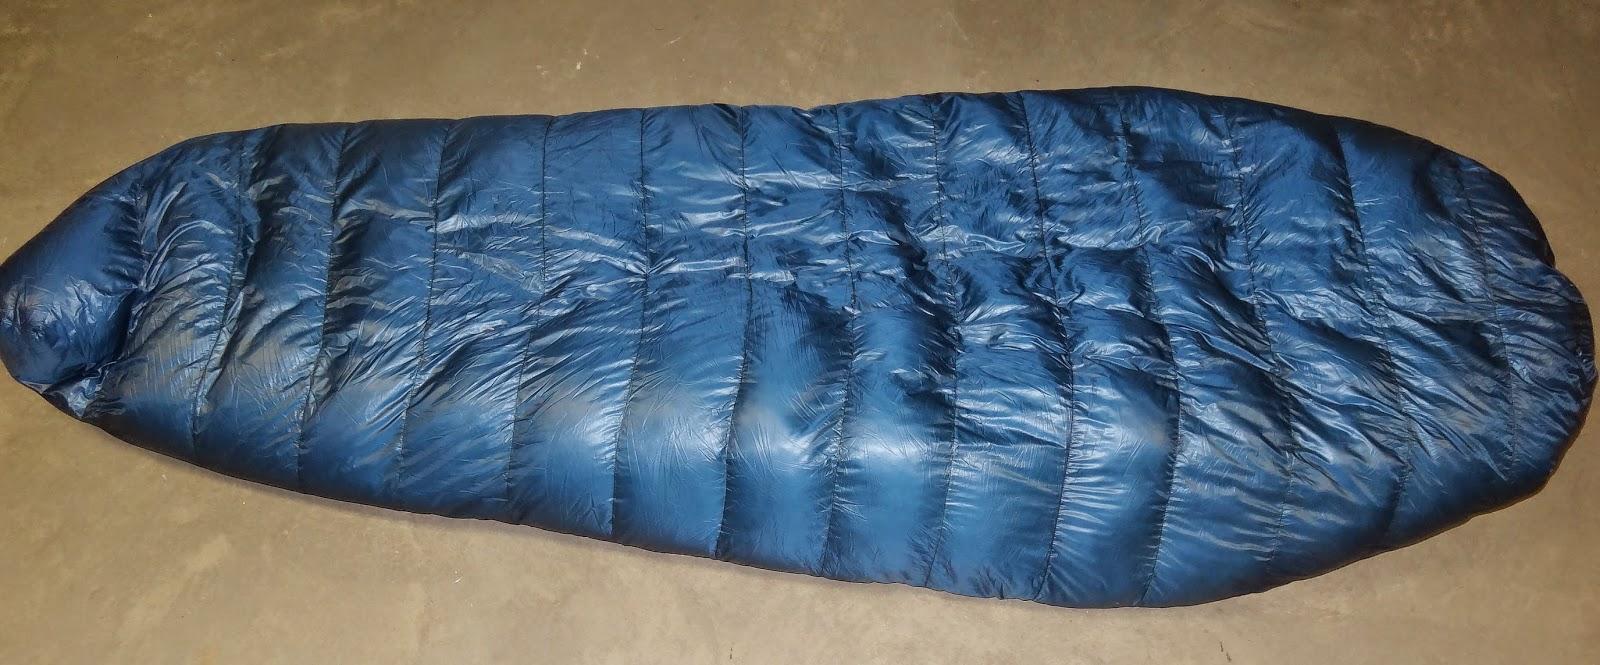 Zpacks 10 Degree Bag In Ventum Ripstop Nylon